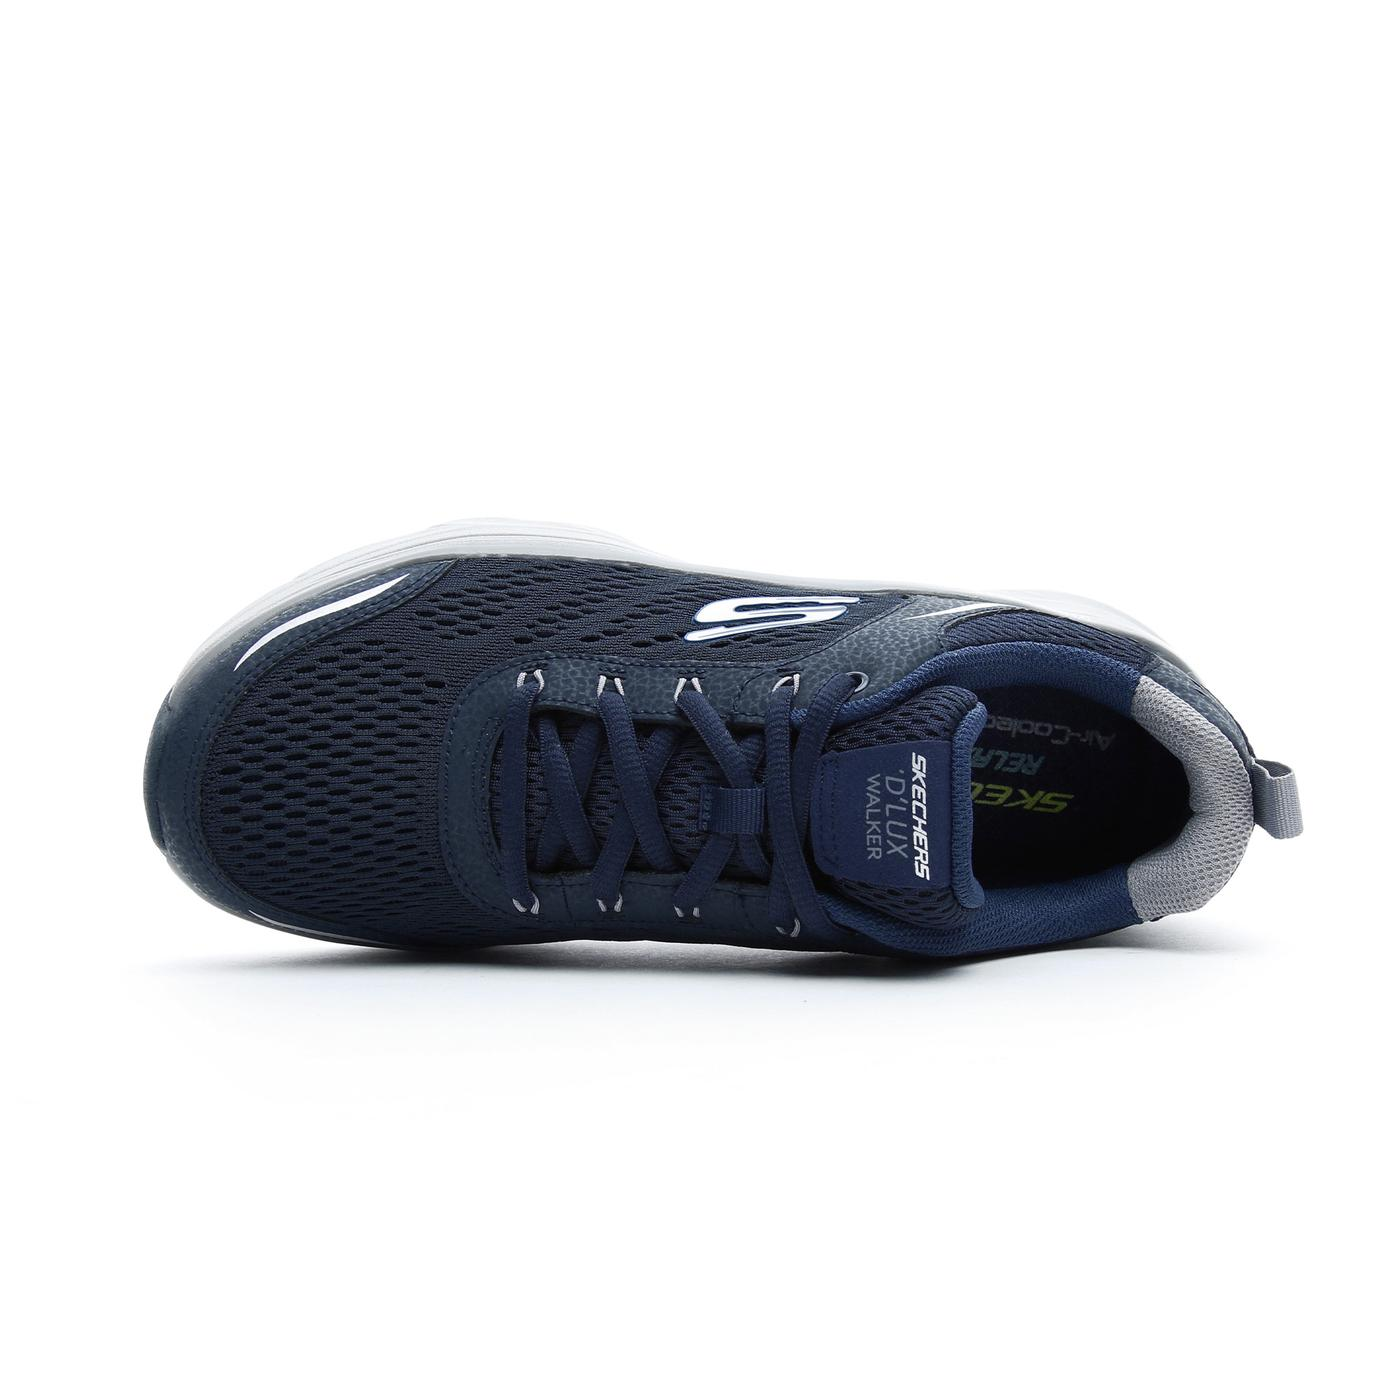 Skechers D'Lux Walker Erkek Lacivert Spor Ayakkabı